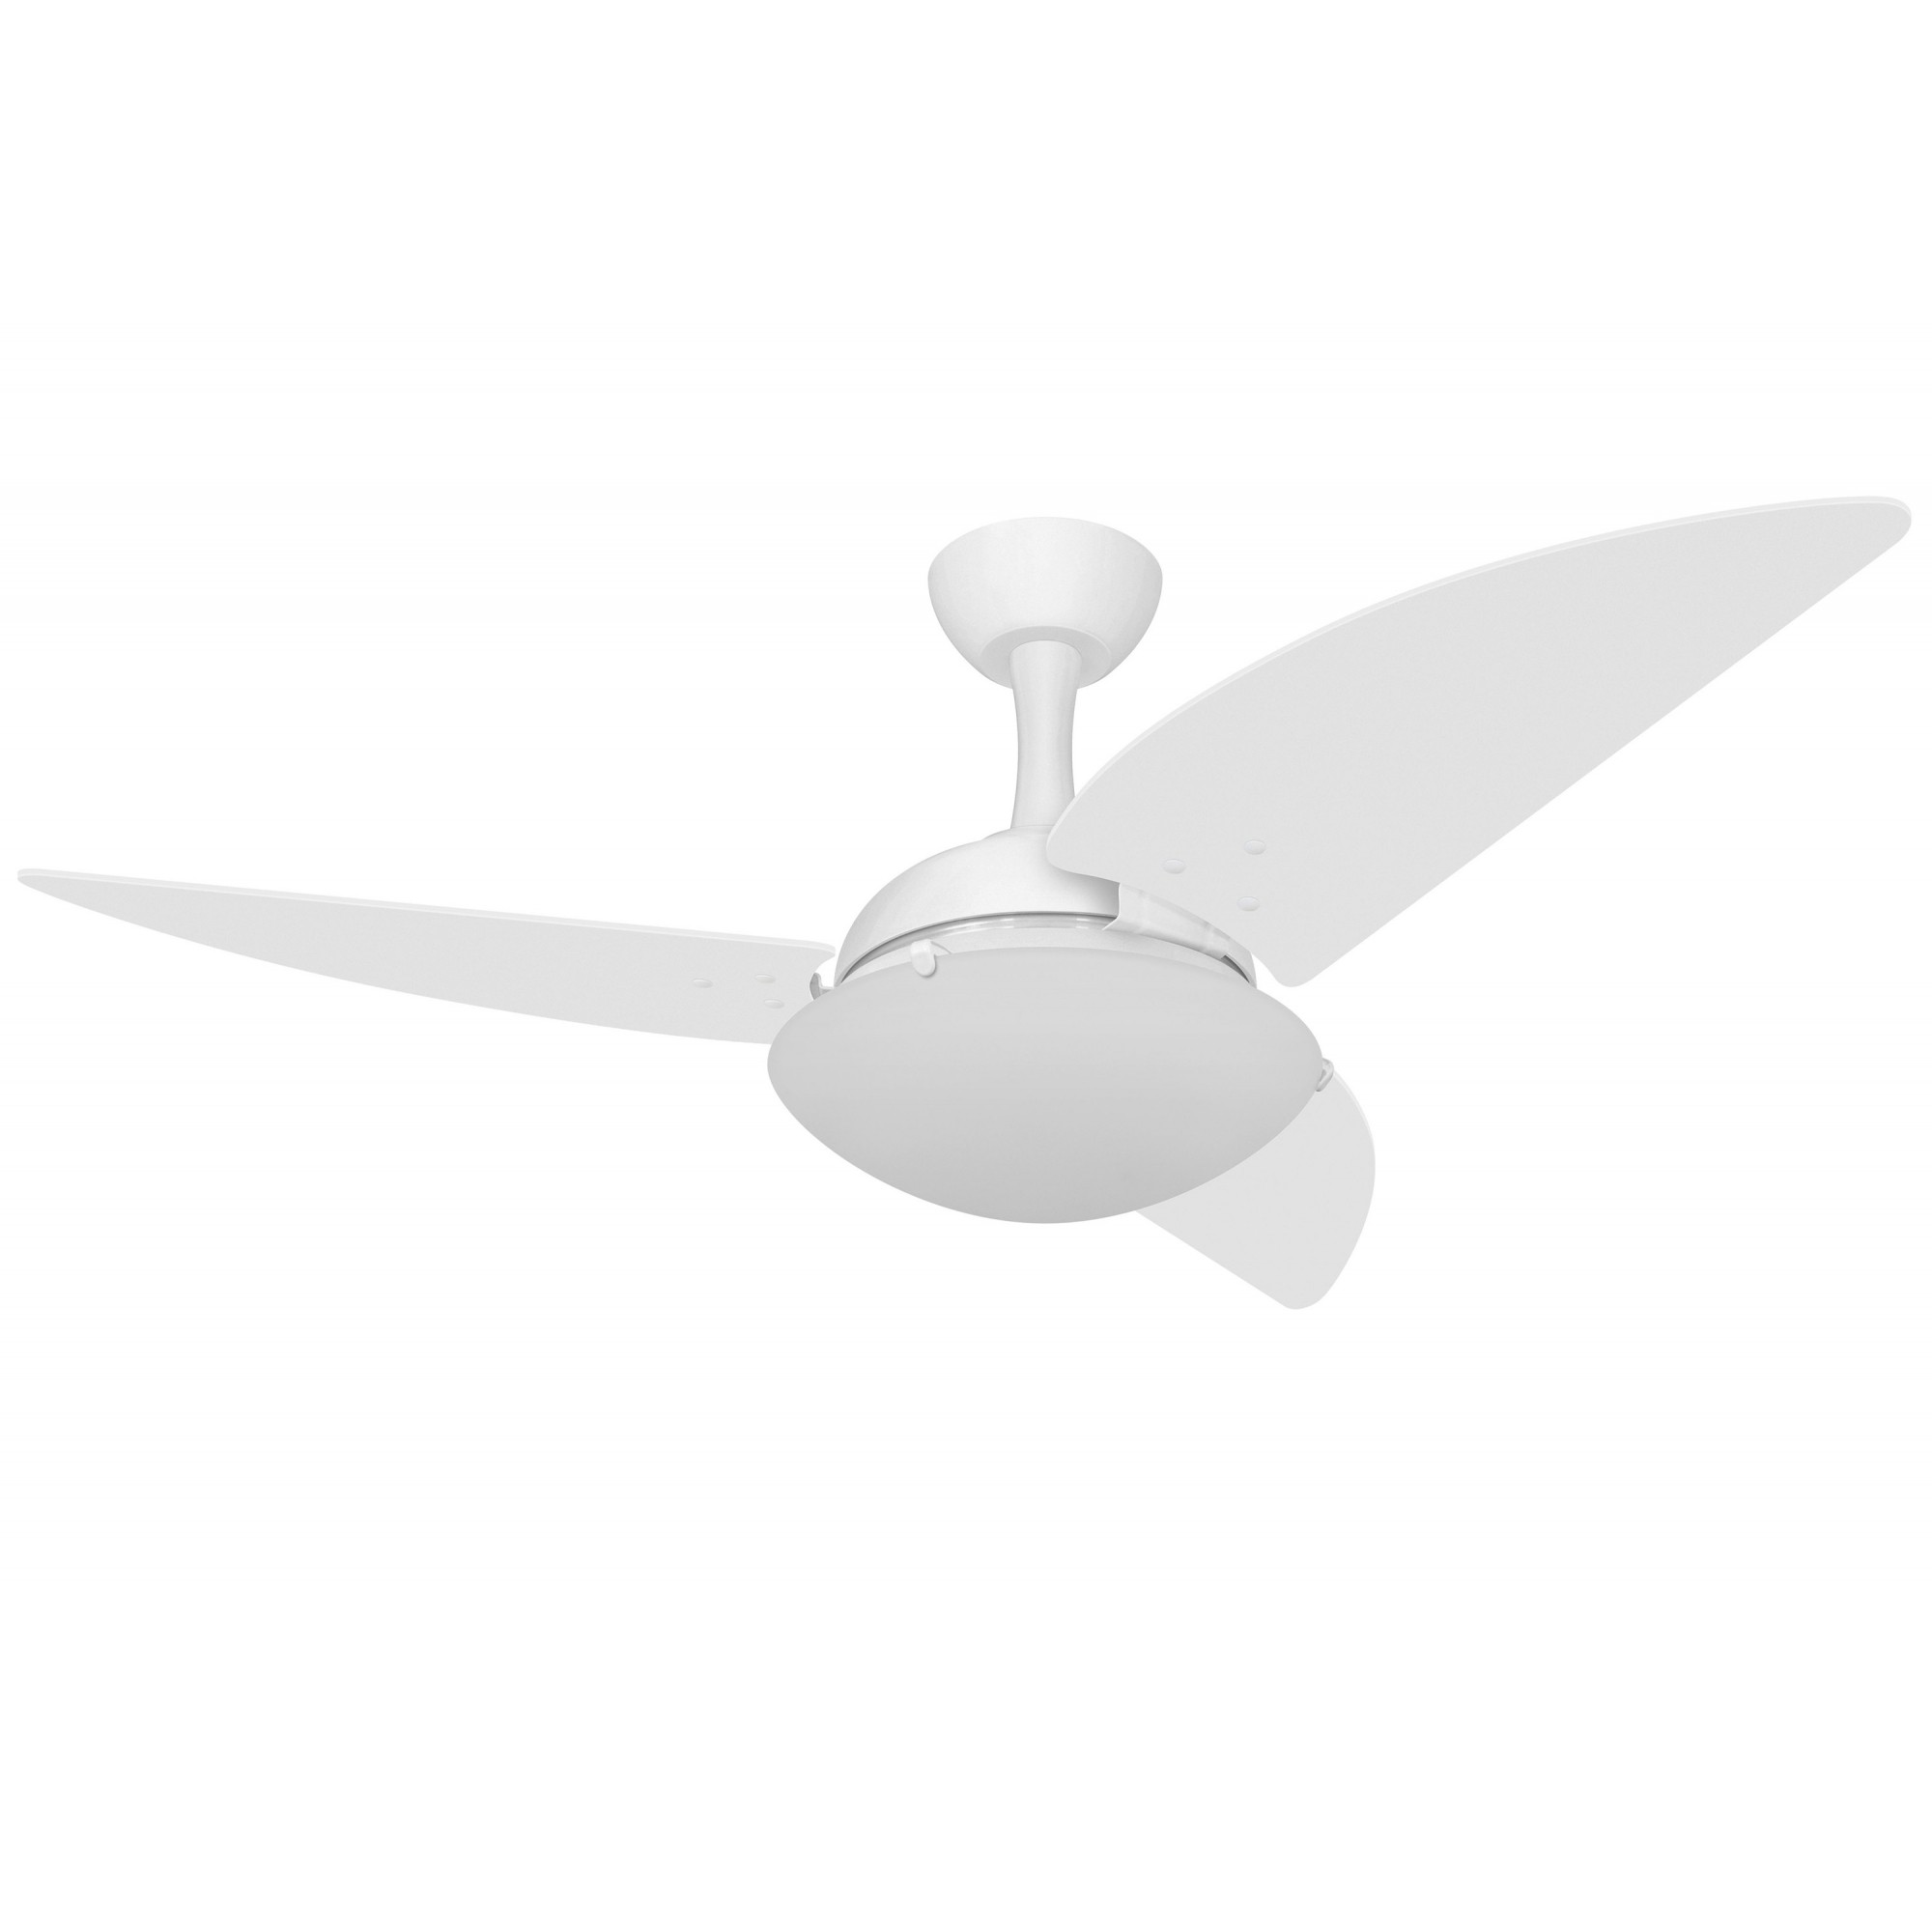 Ventilador de Teto Ventax Uno Branco 220V 130W + Controle R.